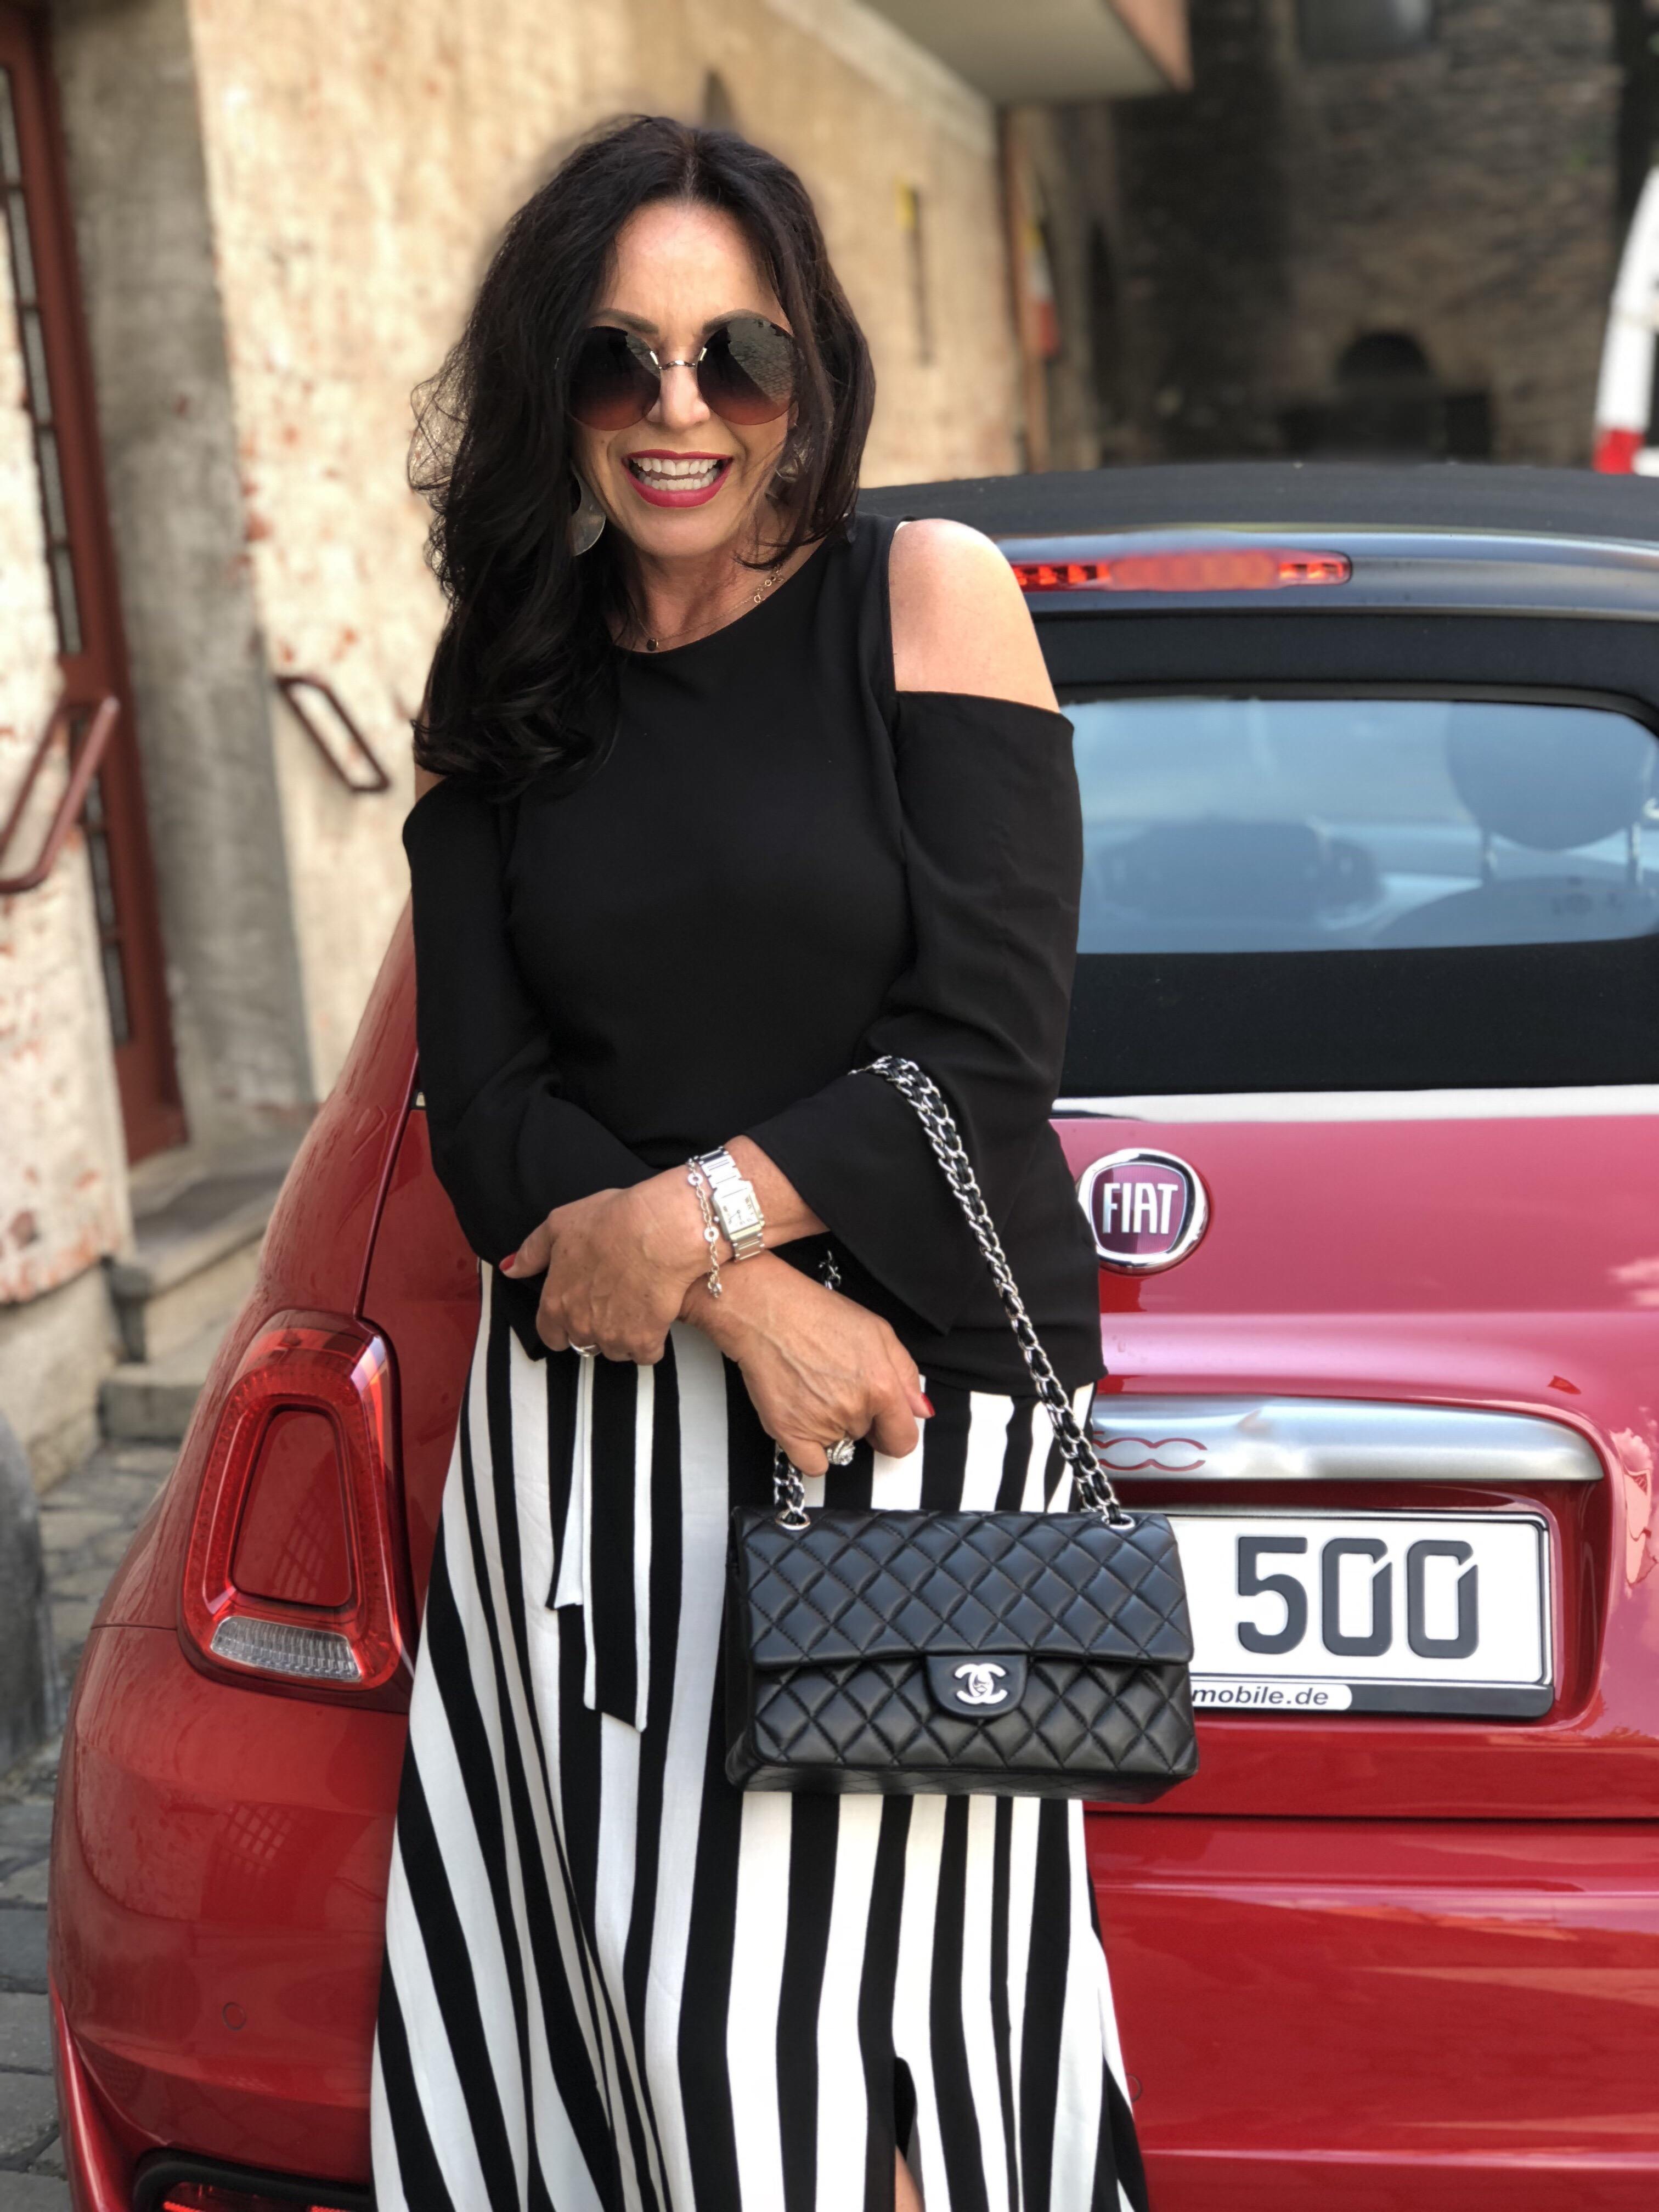 Black and white skirt // red car